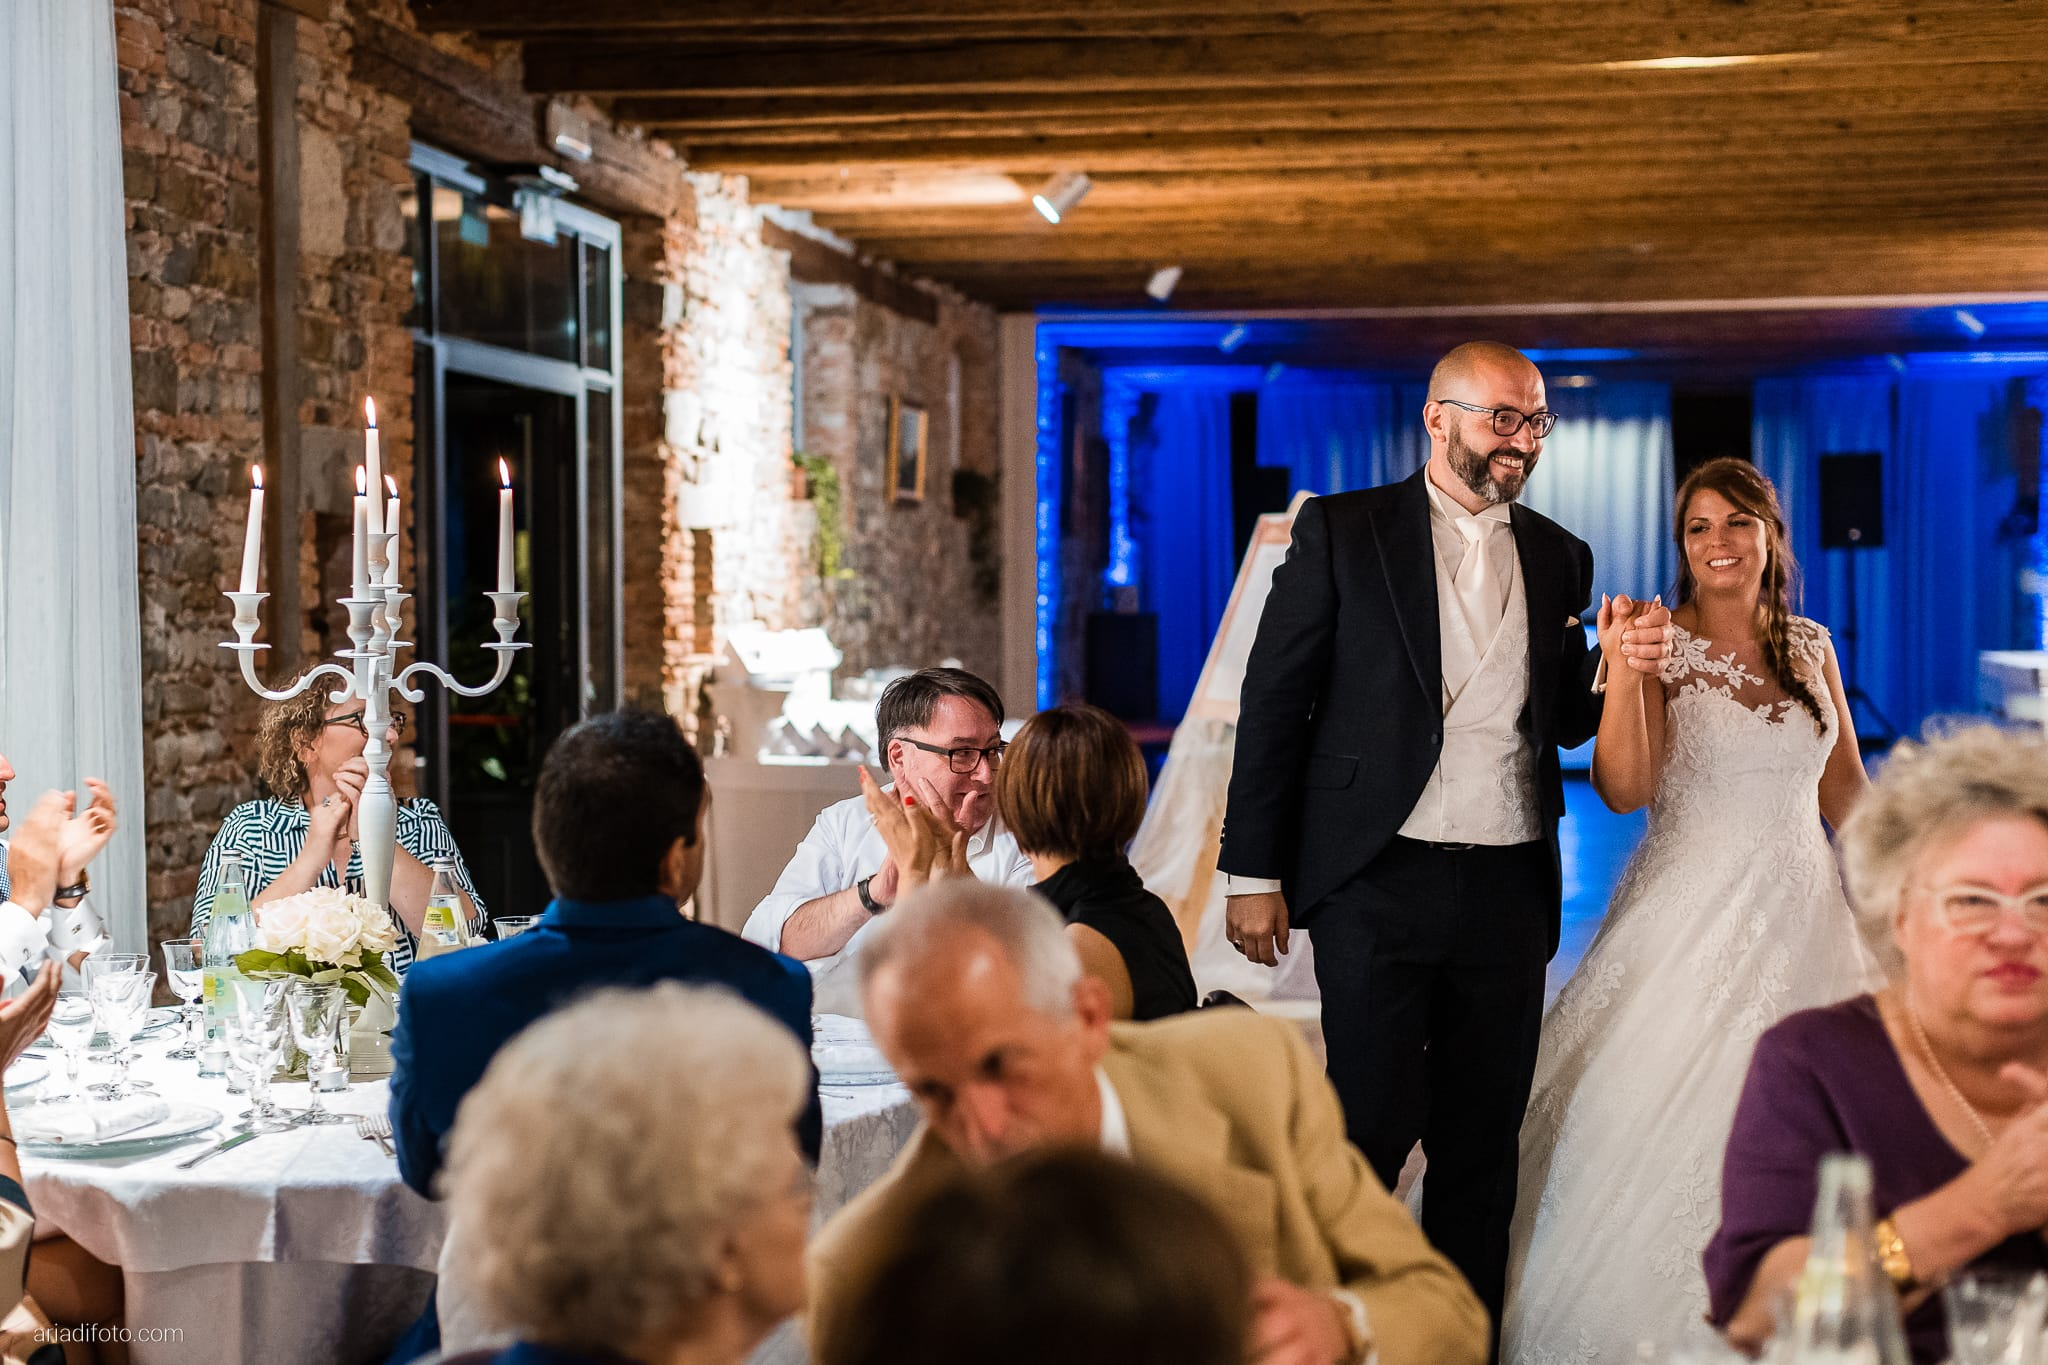 Lavinia Daniele Matrimonio Medea Gorizia Villa Elodia Trivignano Udinese Udine ricevimento cena